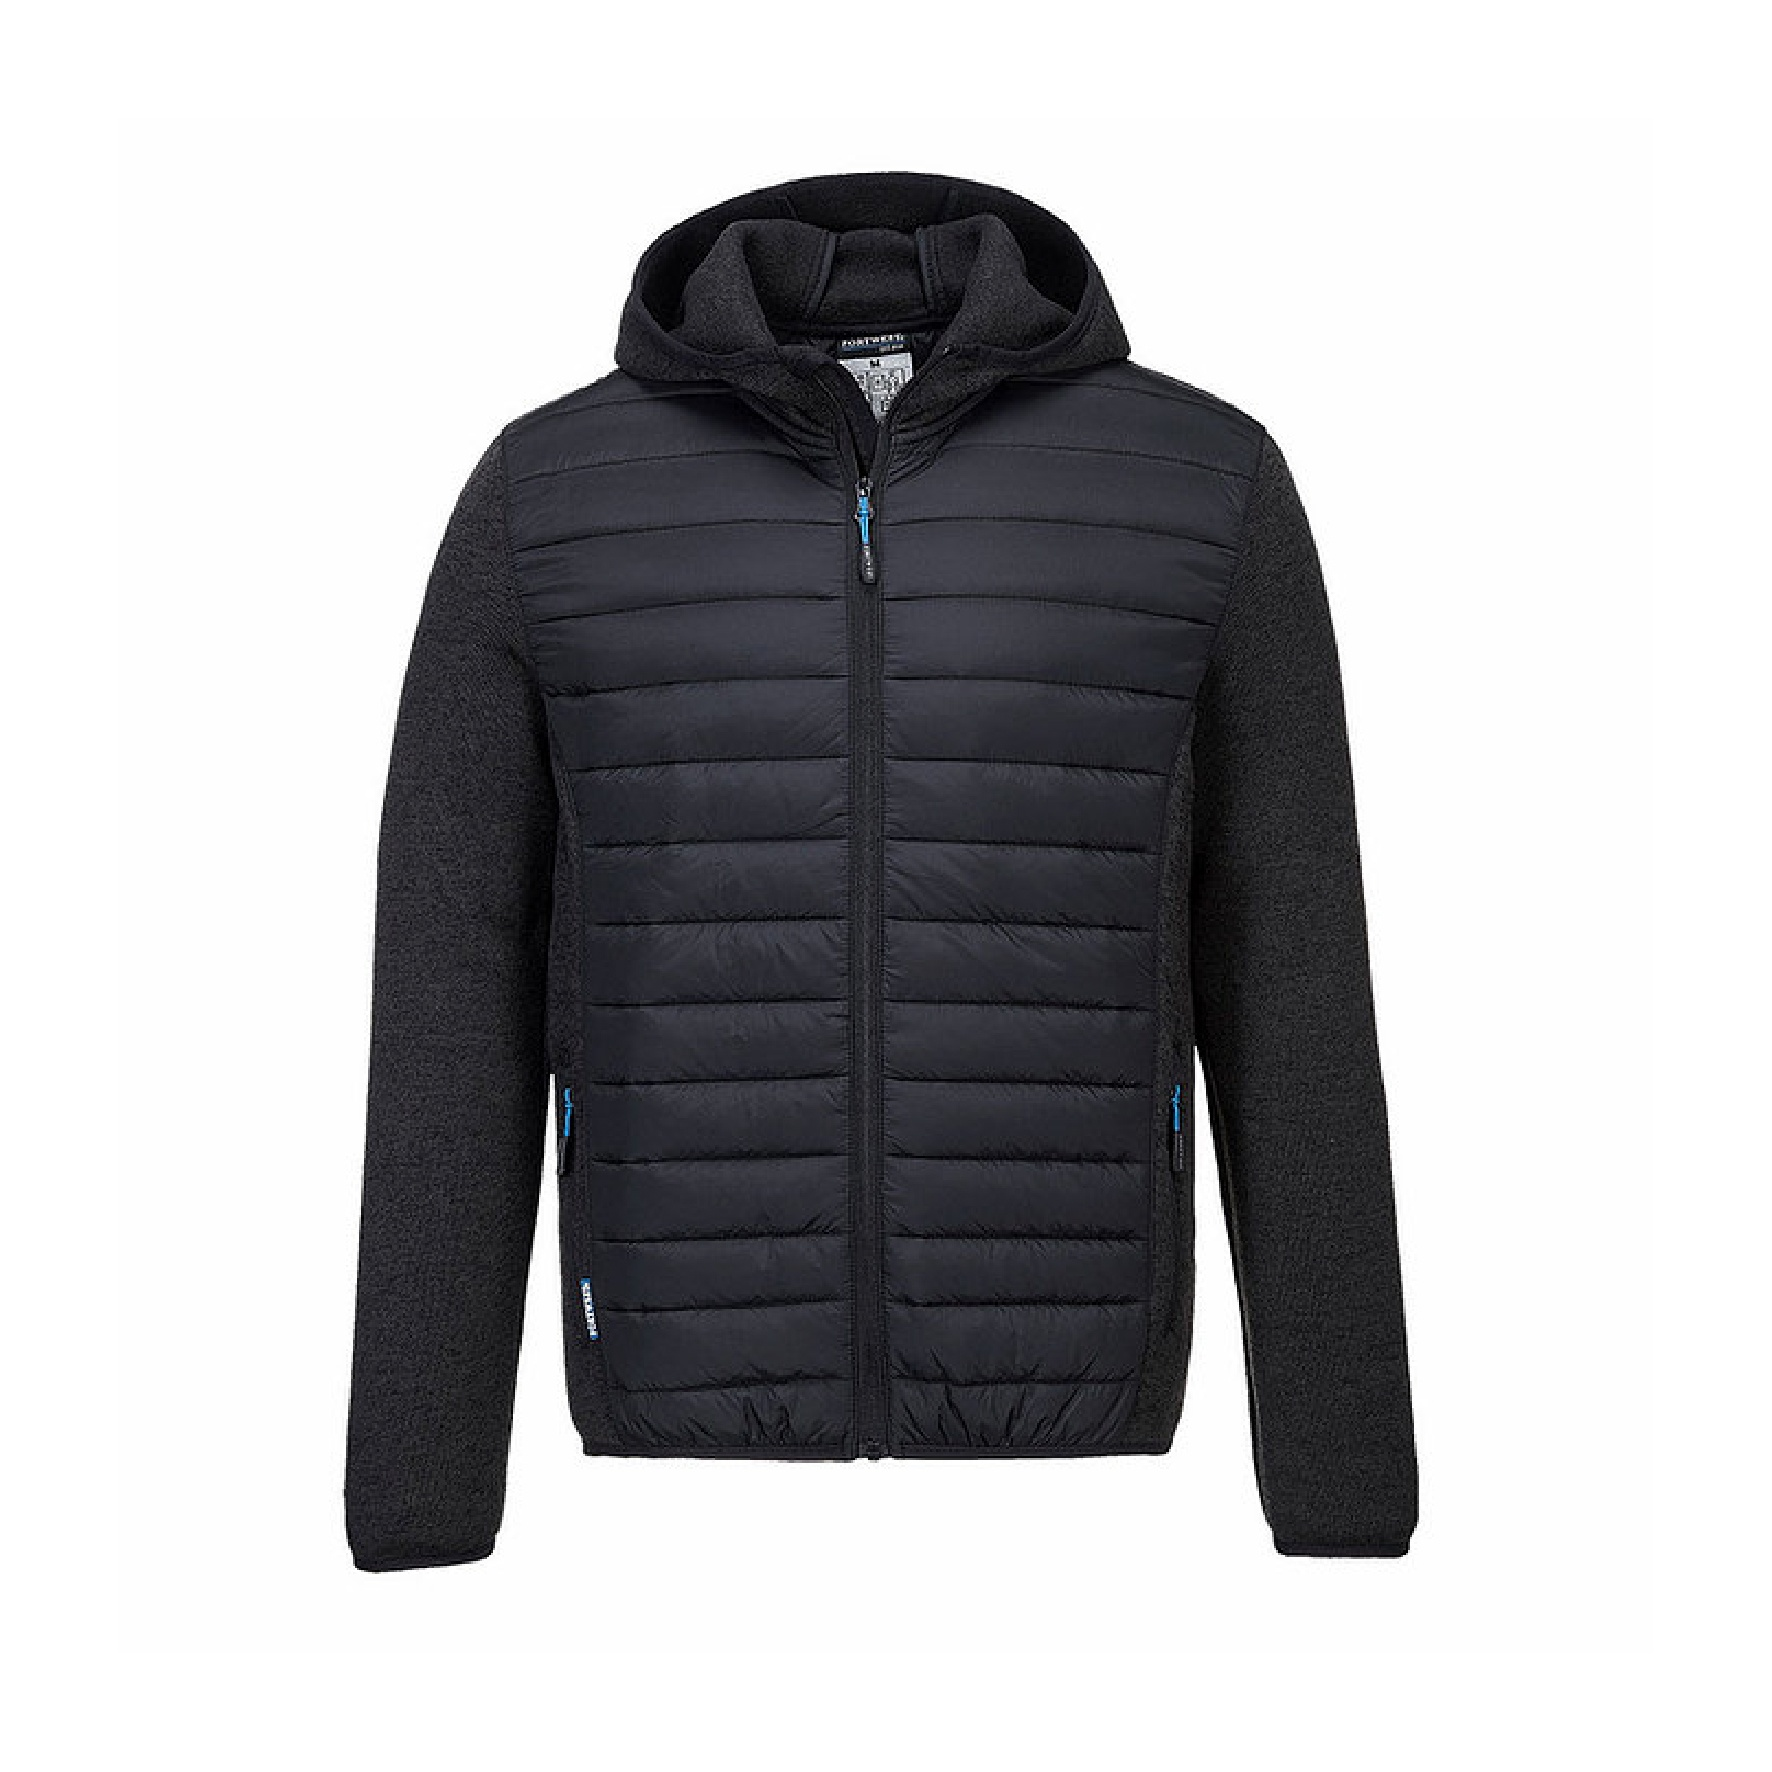 Redrok Workwear Centre Plymouth - KX3 Baffle Jacket